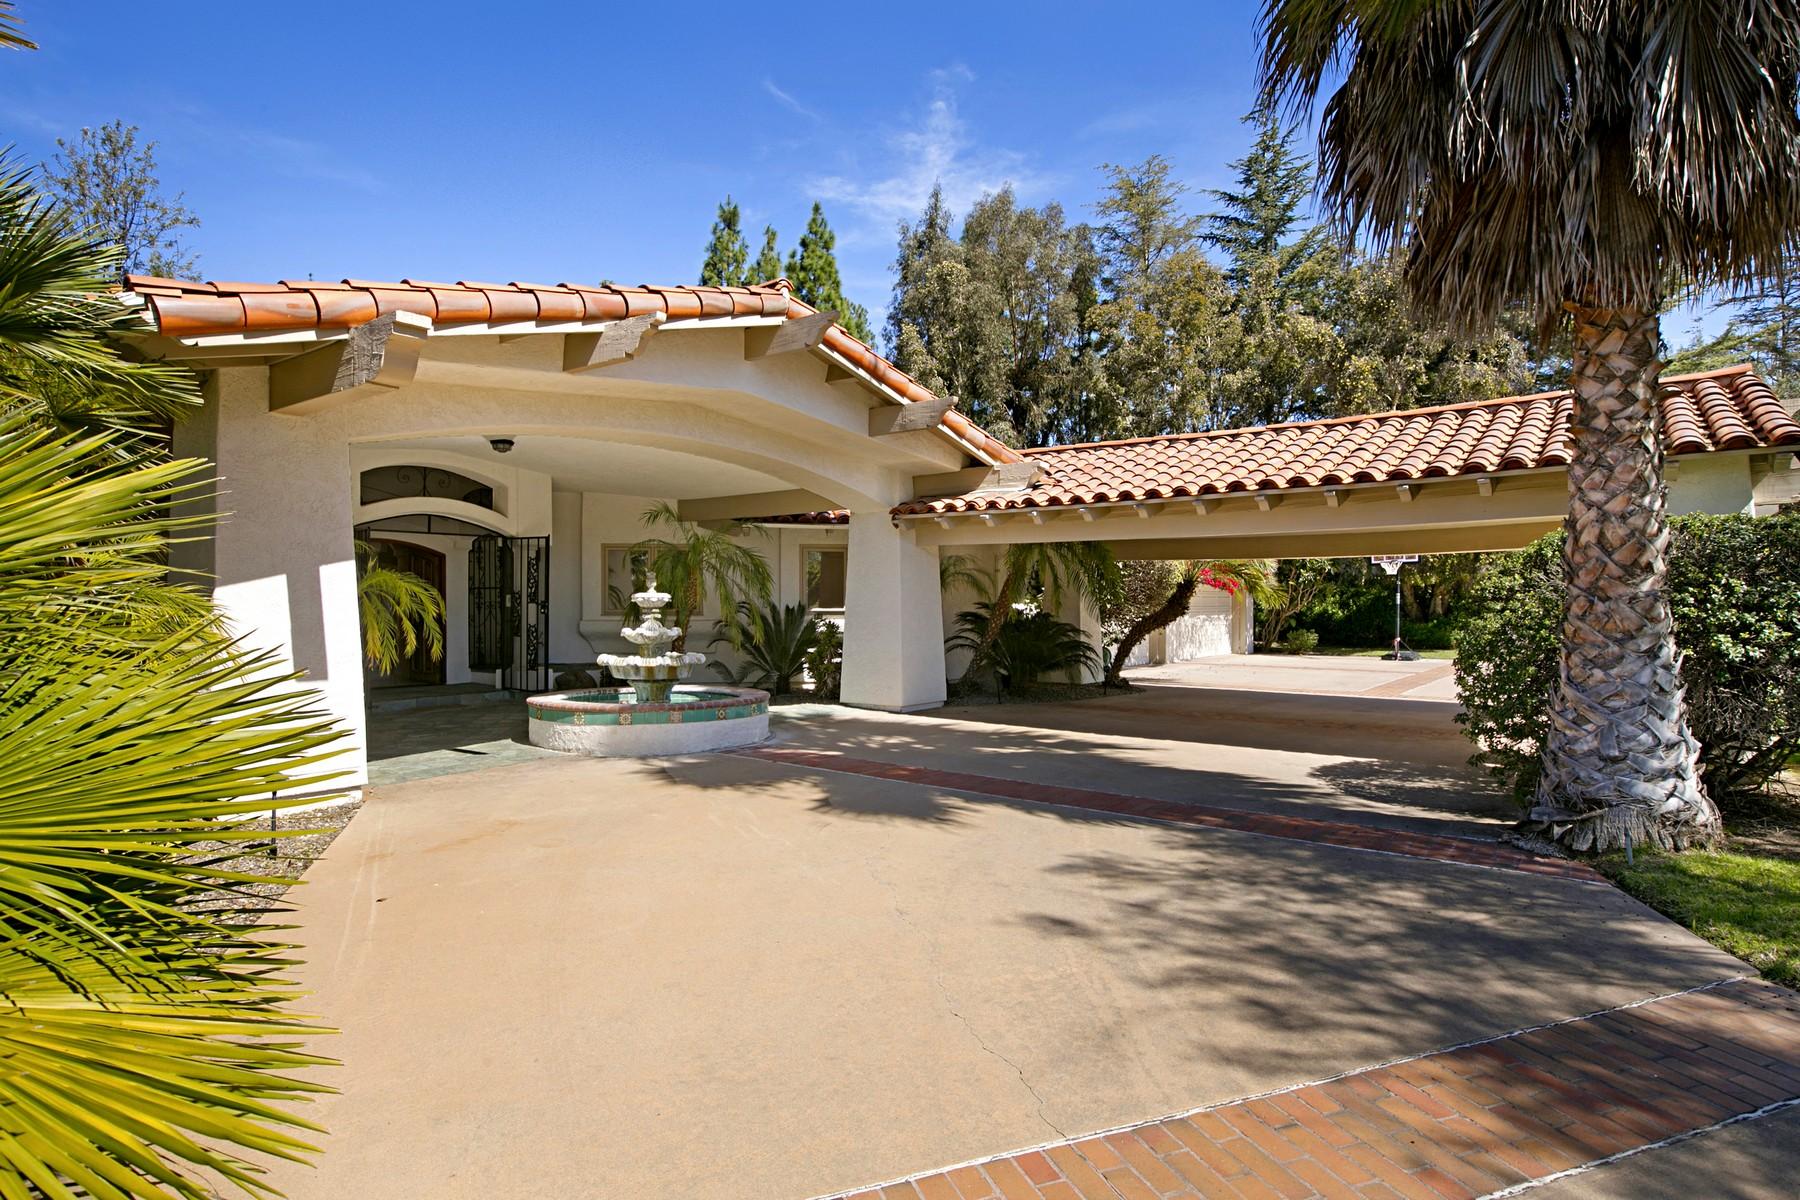 Single Family Home for Sale at 18714 Bernardo Trails San Diego, California, 92128 United States